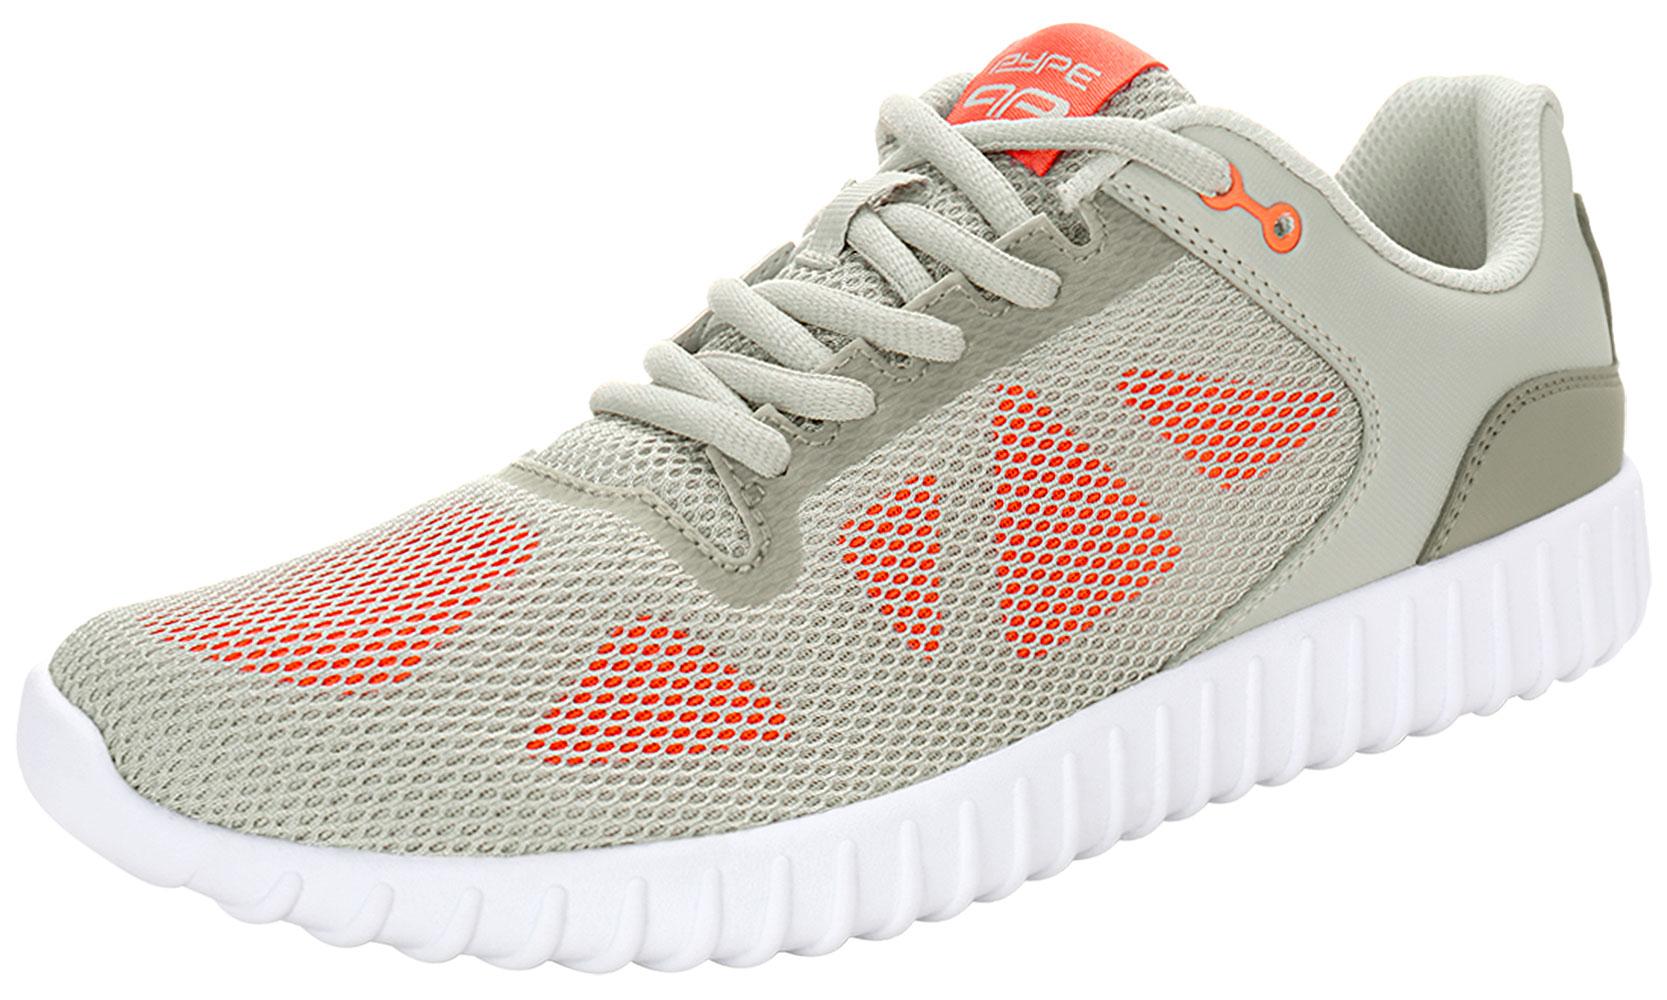 PYPE Women Geometric Prints Lace Up Mesh Training Shoes Gray US 9